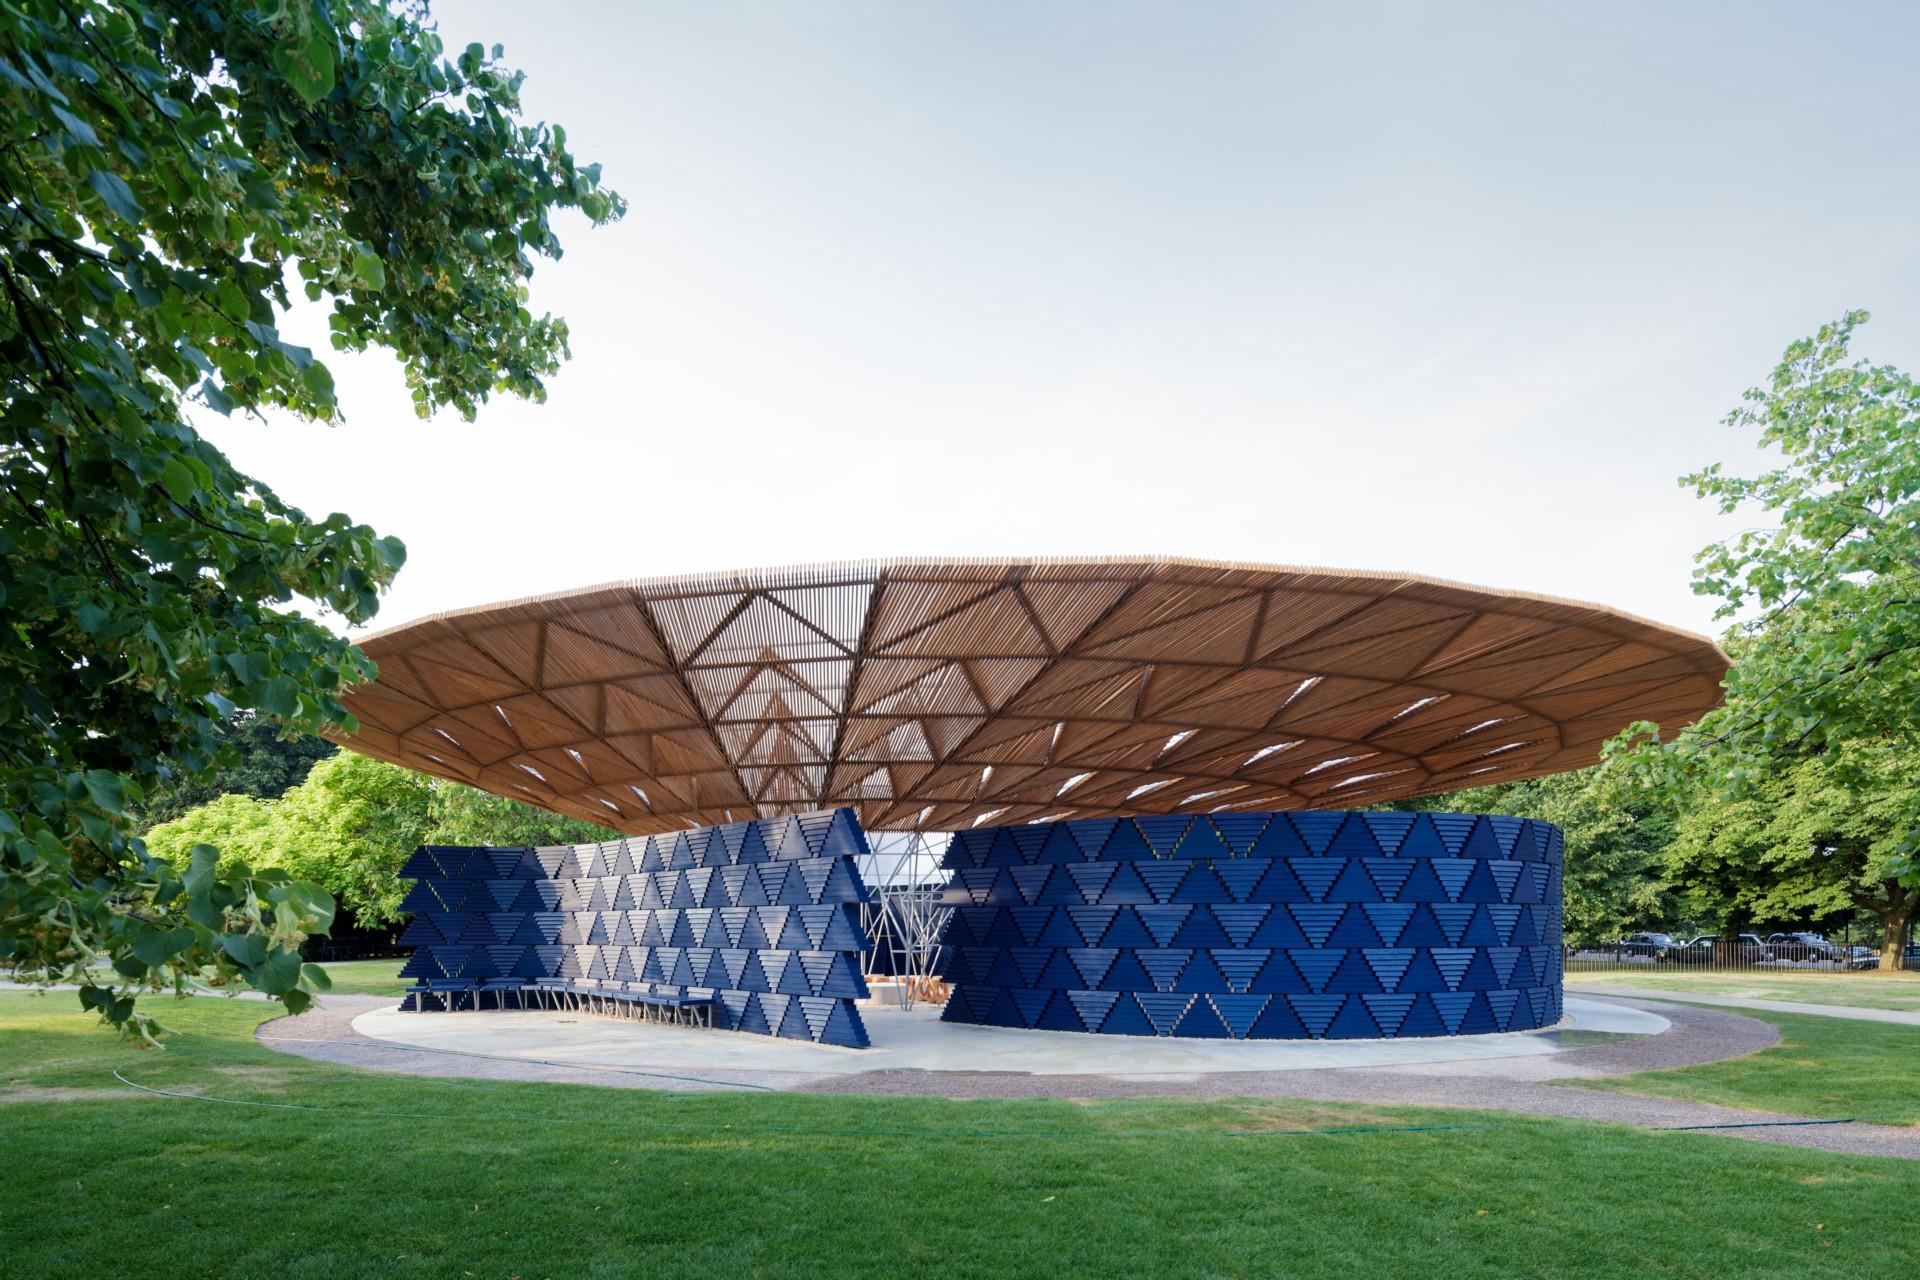 Inaugurado el Serpentine Pavilion de Diébédo Francis Kéré